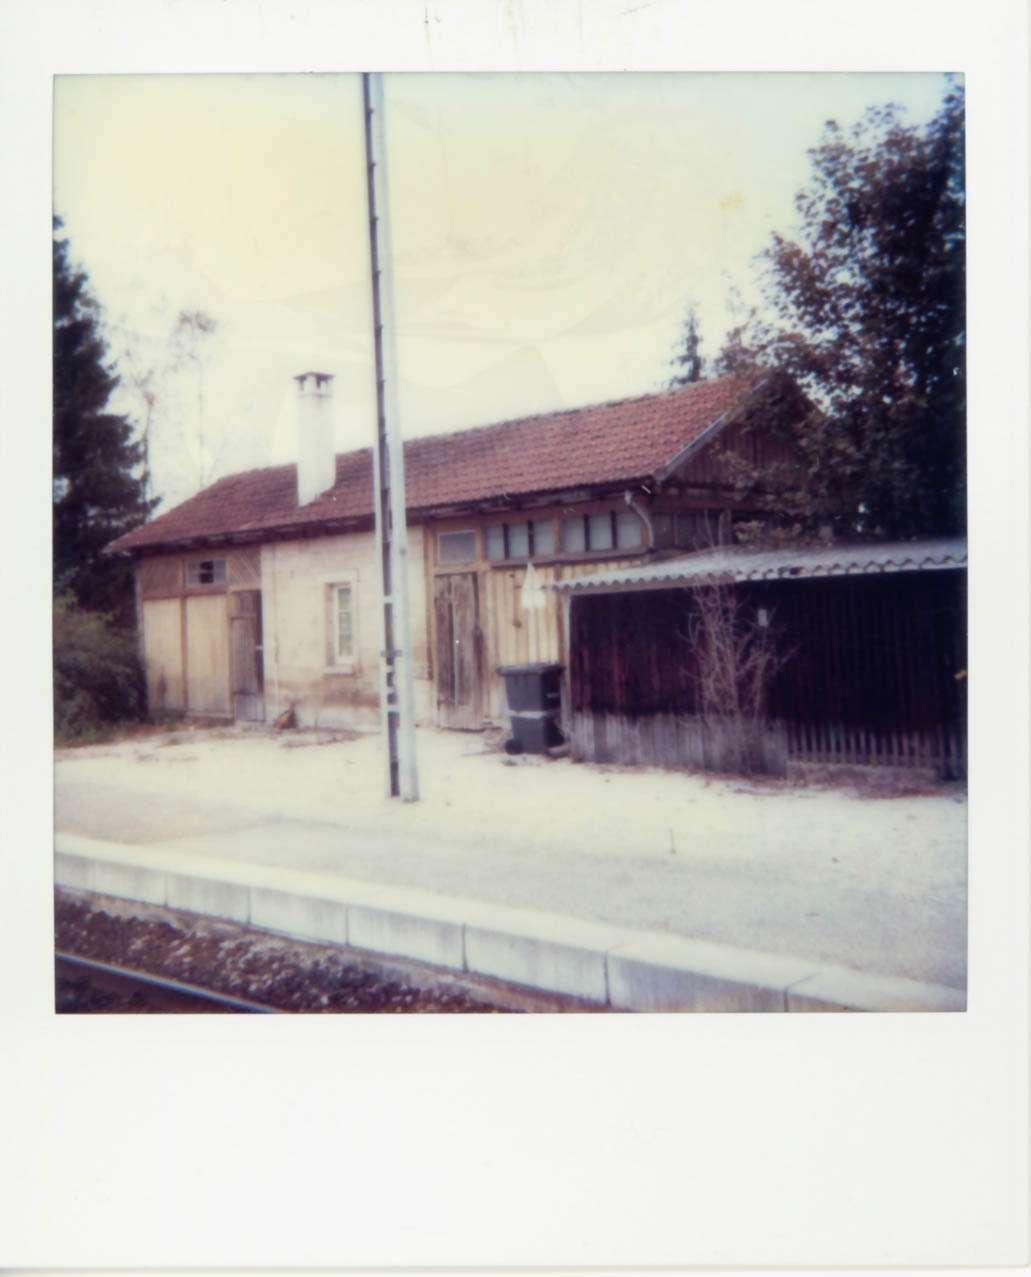 Fichtenberg: 3 Fotos u.a., Bild 1